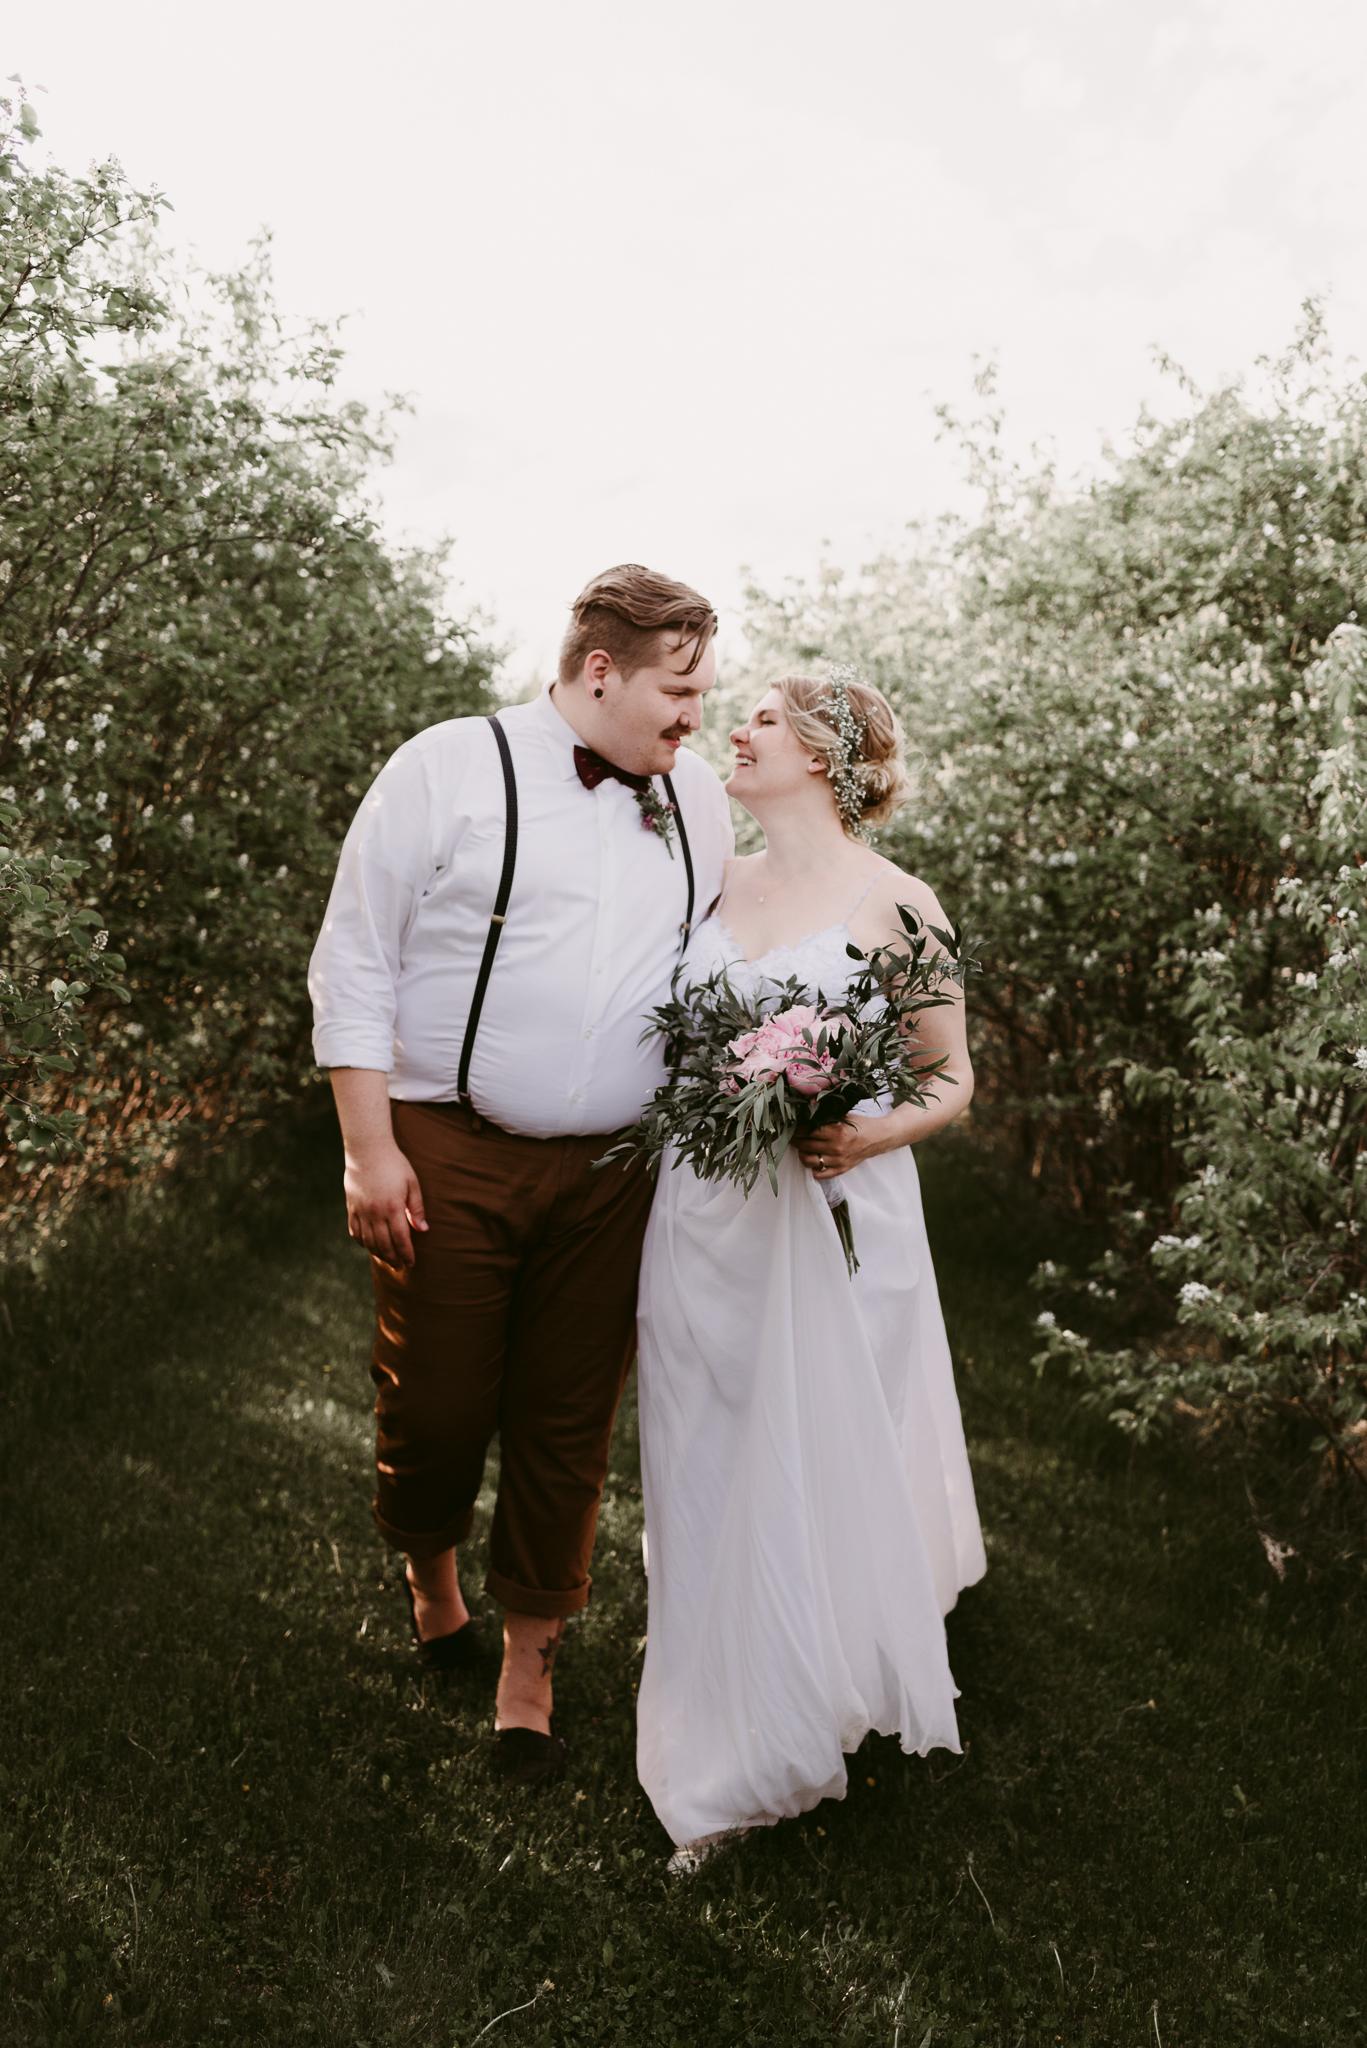 D&P-weddingblog-234.jpg